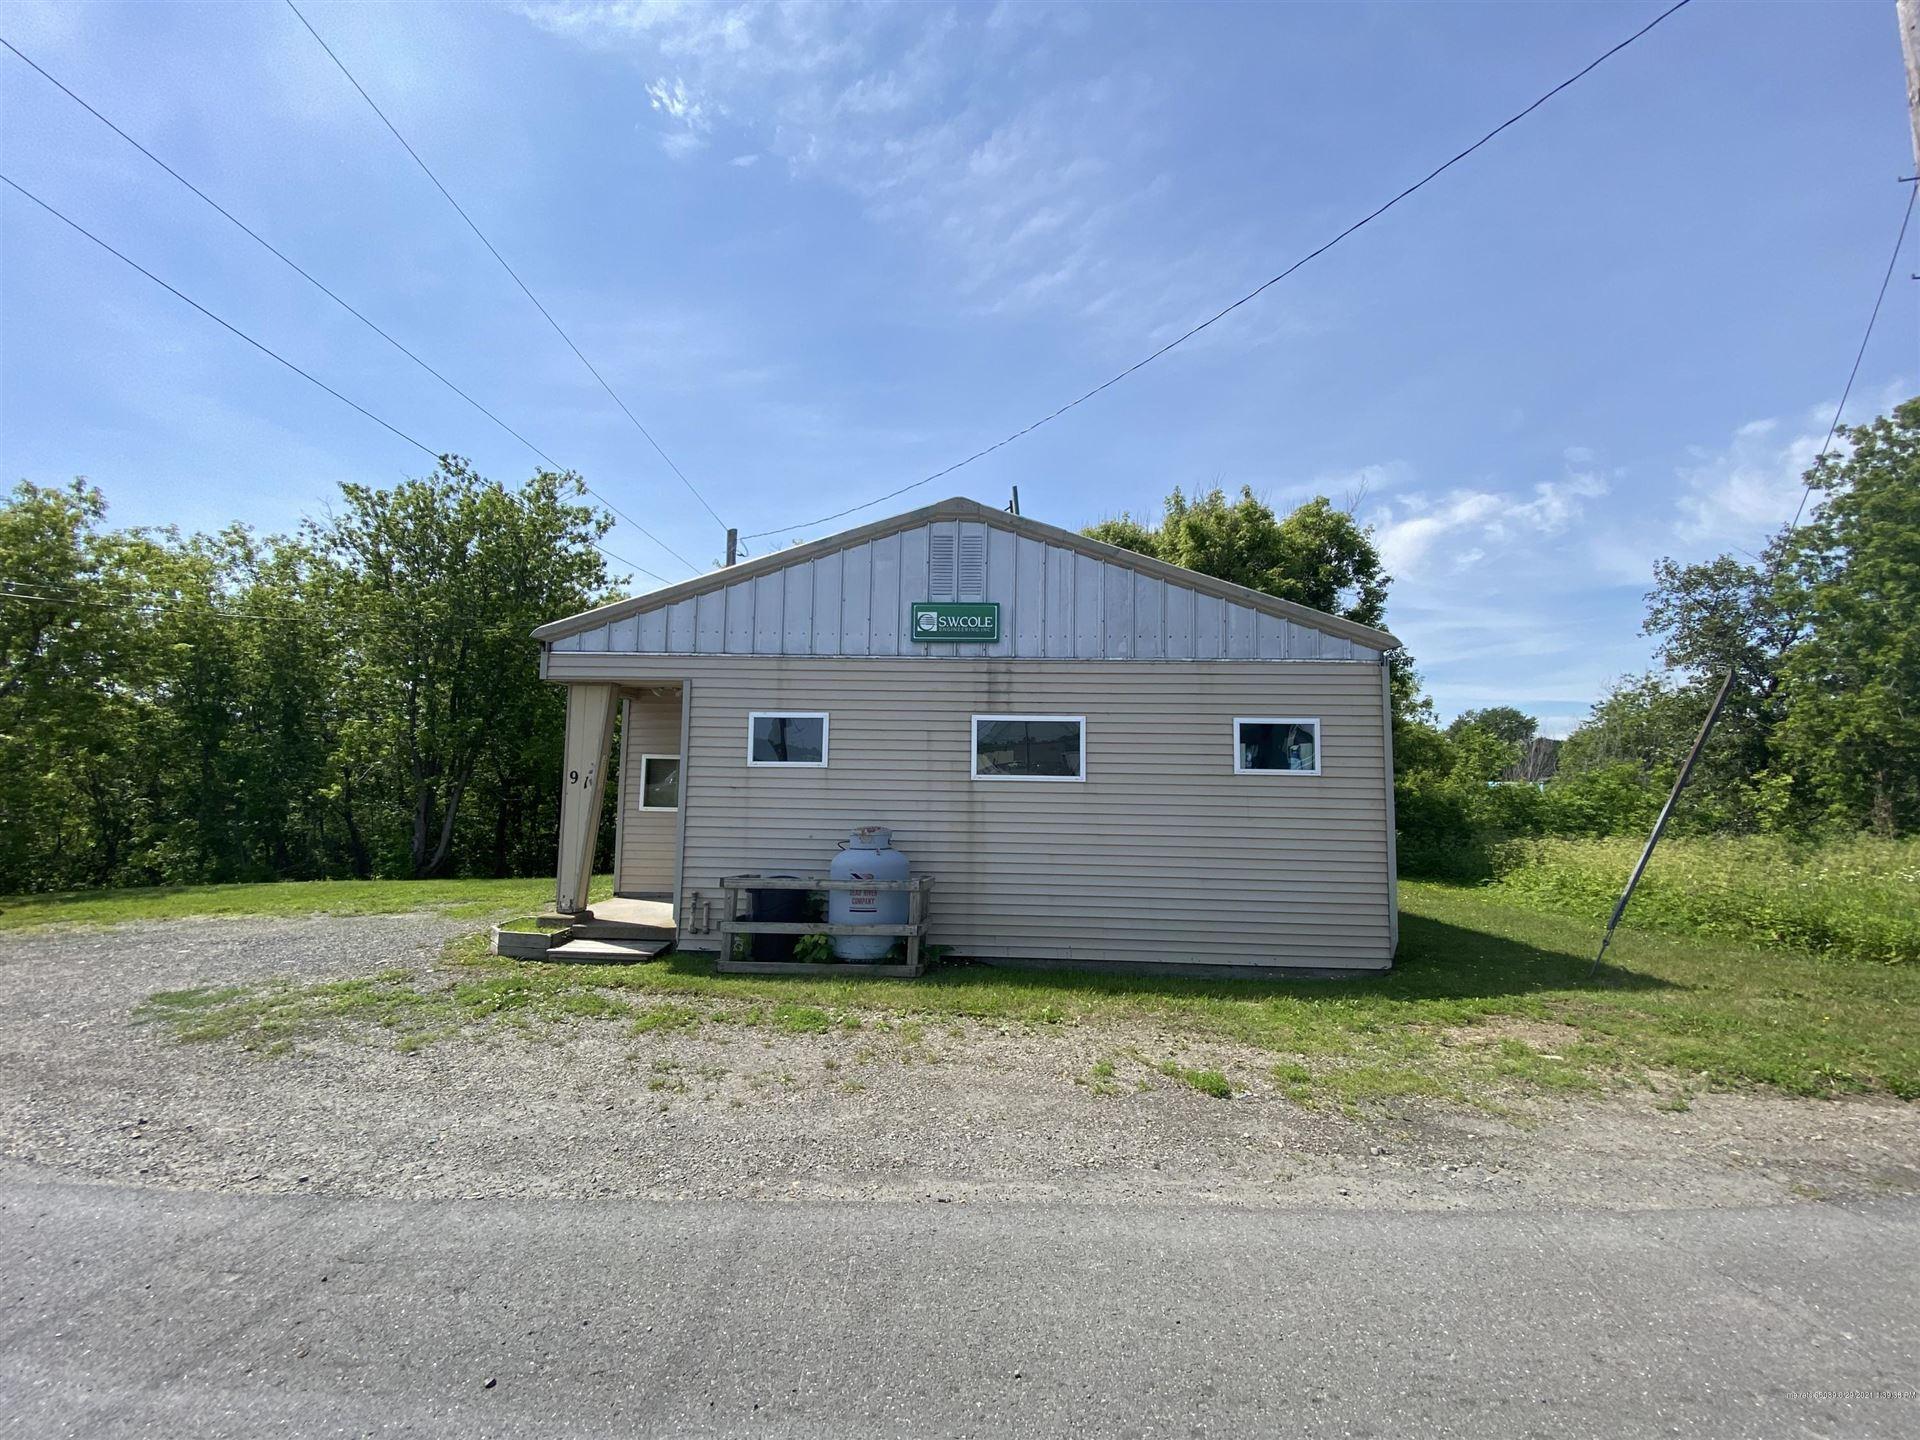 Photo of 91 Water Street, Caribou, ME 04736 (MLS # 1498327)